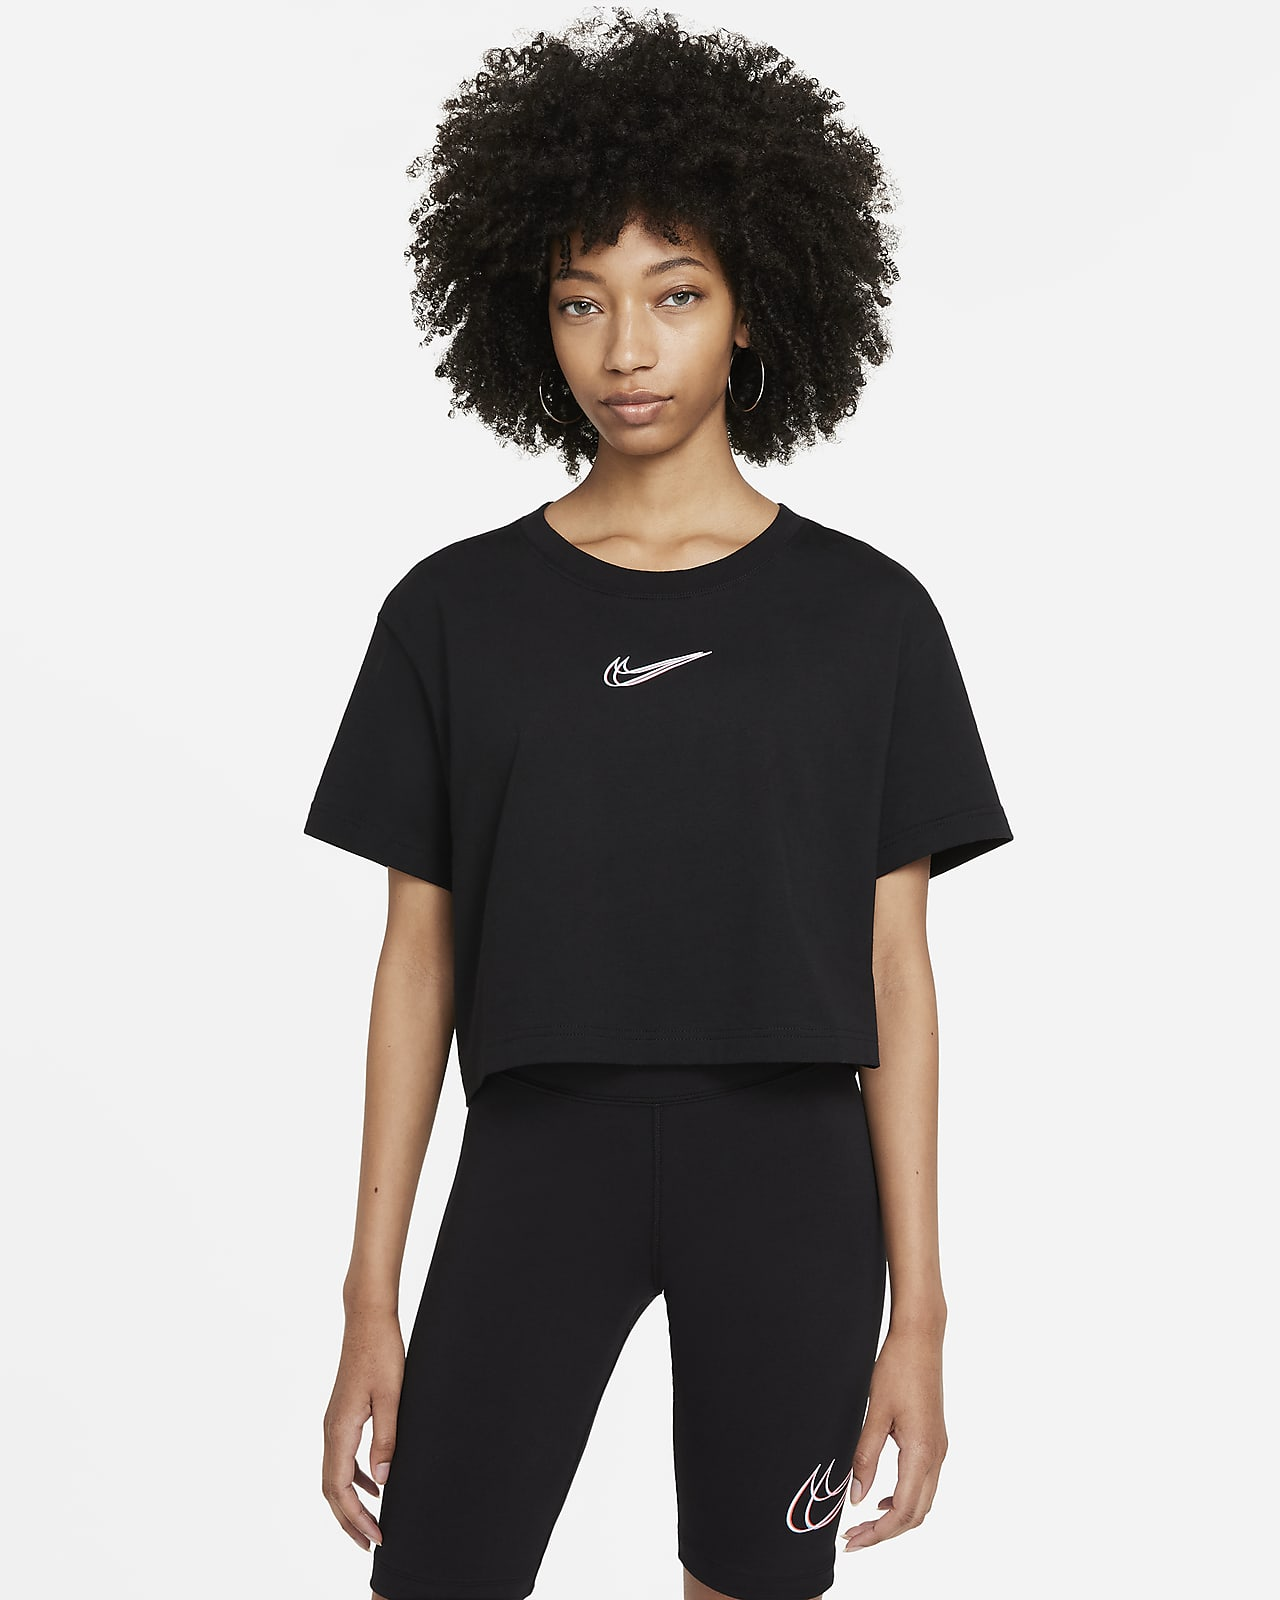 Damski T-shirt do tańca o krótkim kroju Nike Sportswear